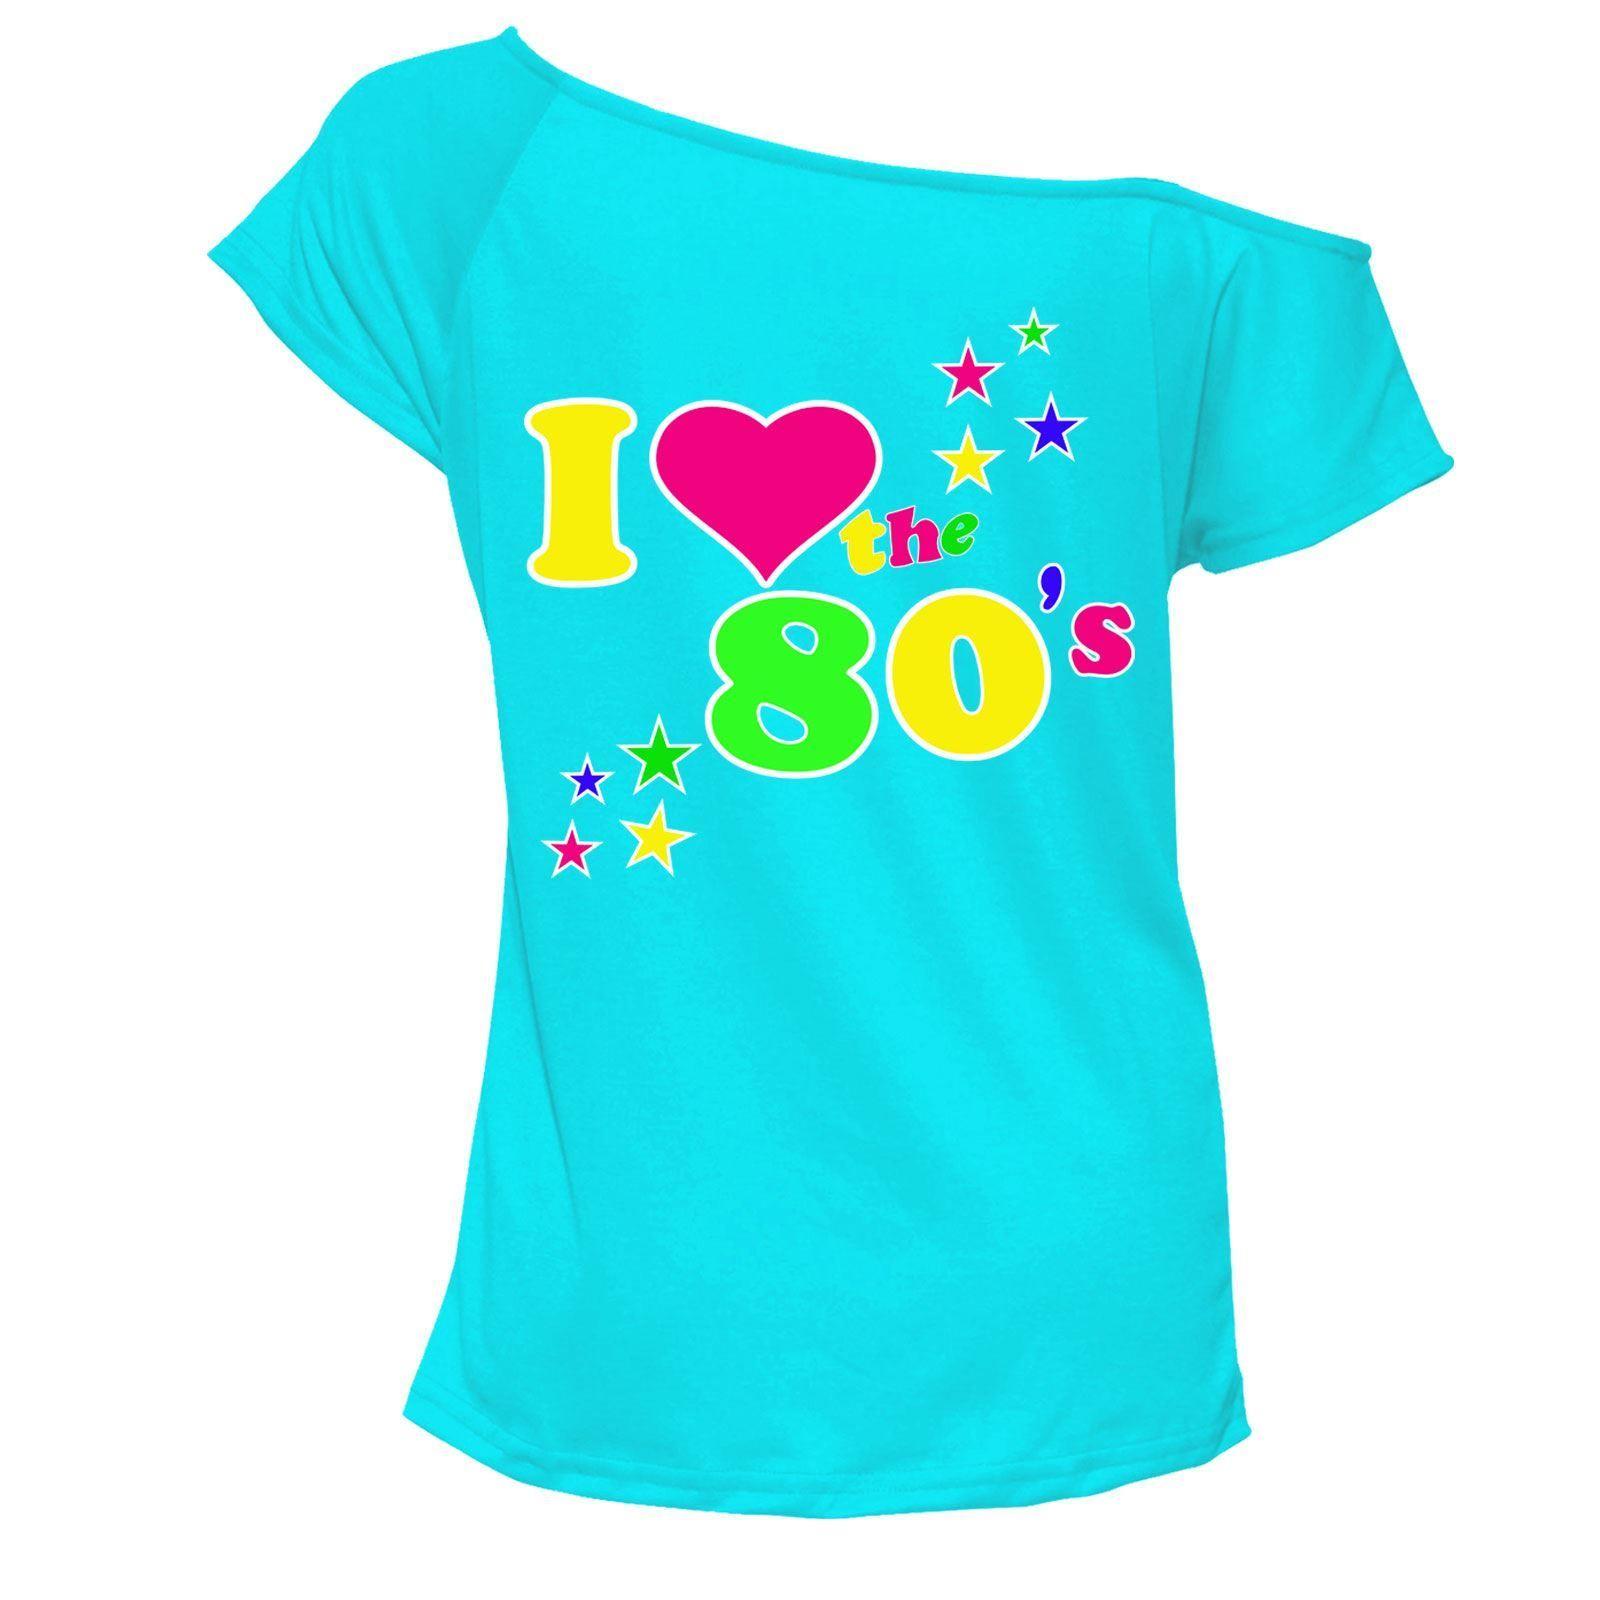 b45f783b Womens Ladies I Love The 80's T-Shirt Fancy Retro Casual Wear Top 6016455?  Lot#apos#Shirt#Womens